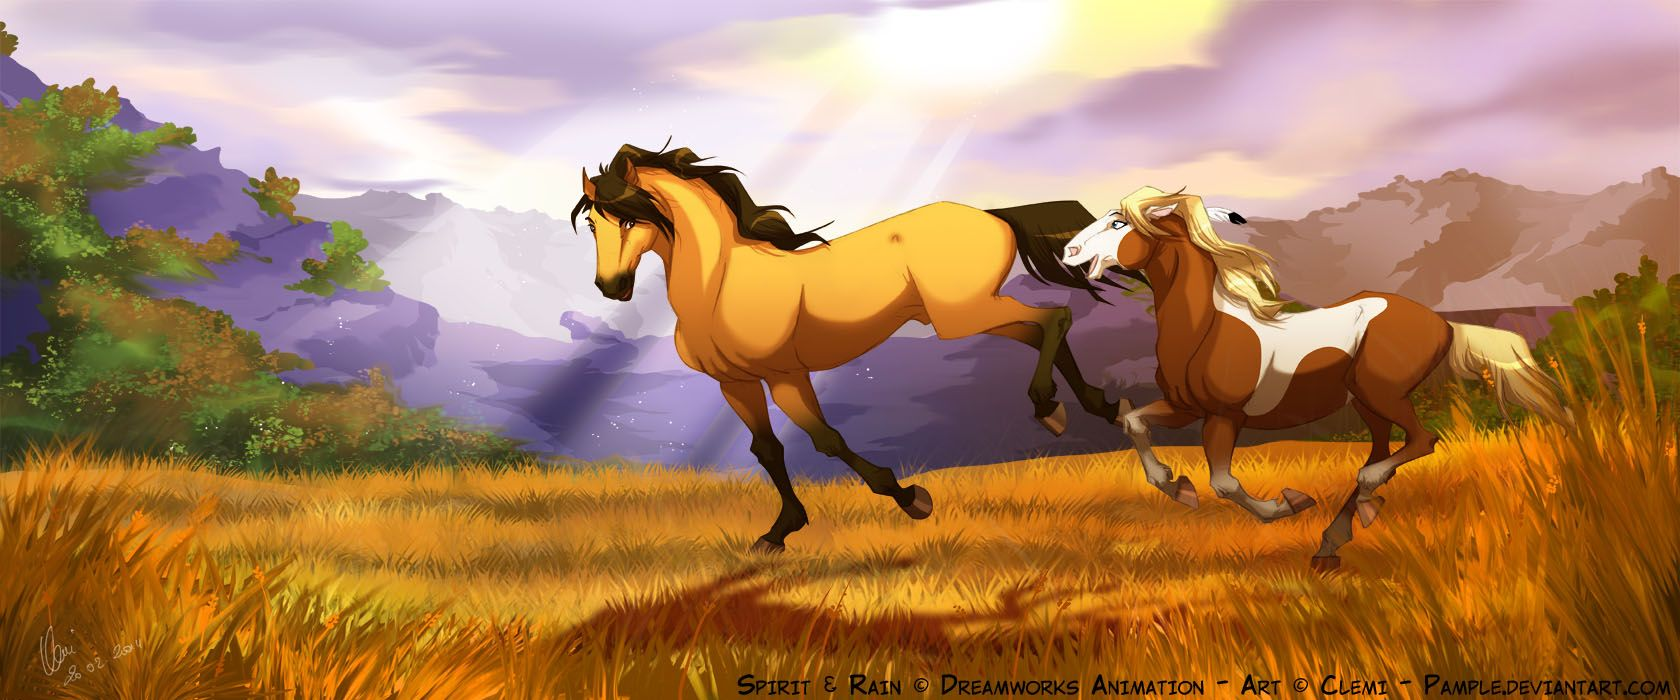 Don T Let Go By Pample On Deviantart Spirit Horse Movie Spirit The Horse Spirit And Rain